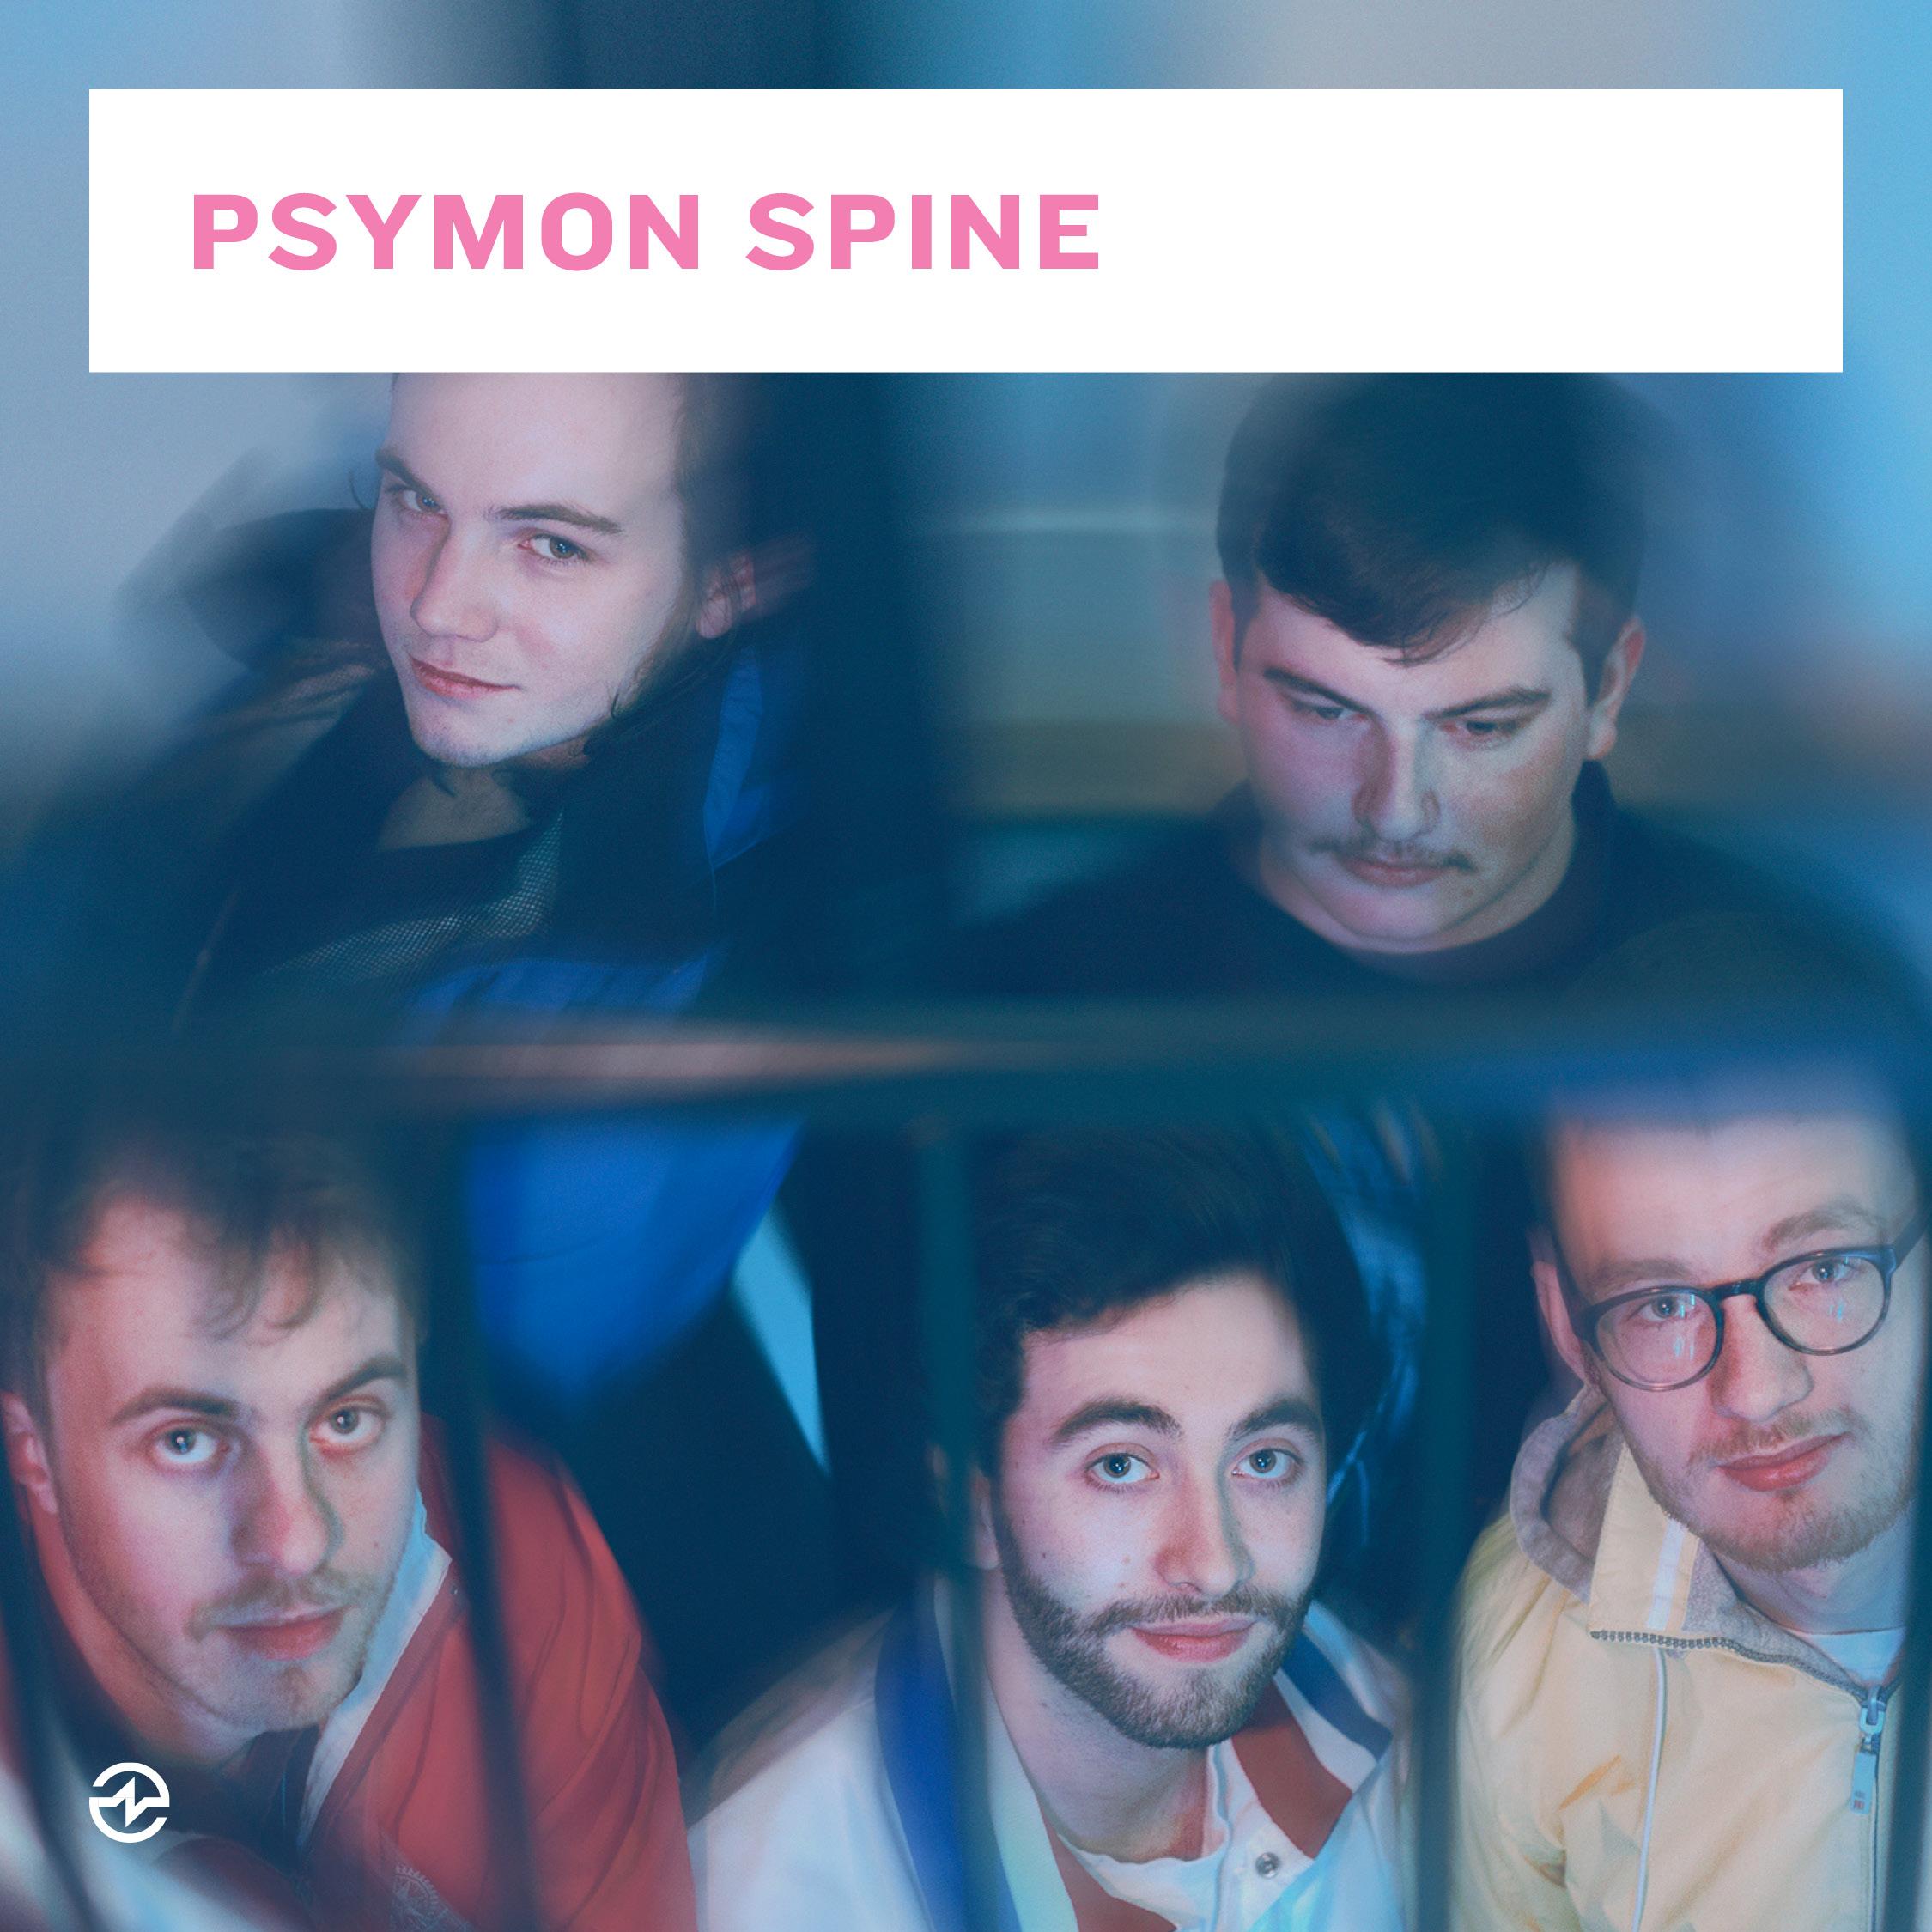 Peter/Noah/Devon/Mike/Nate/Friends